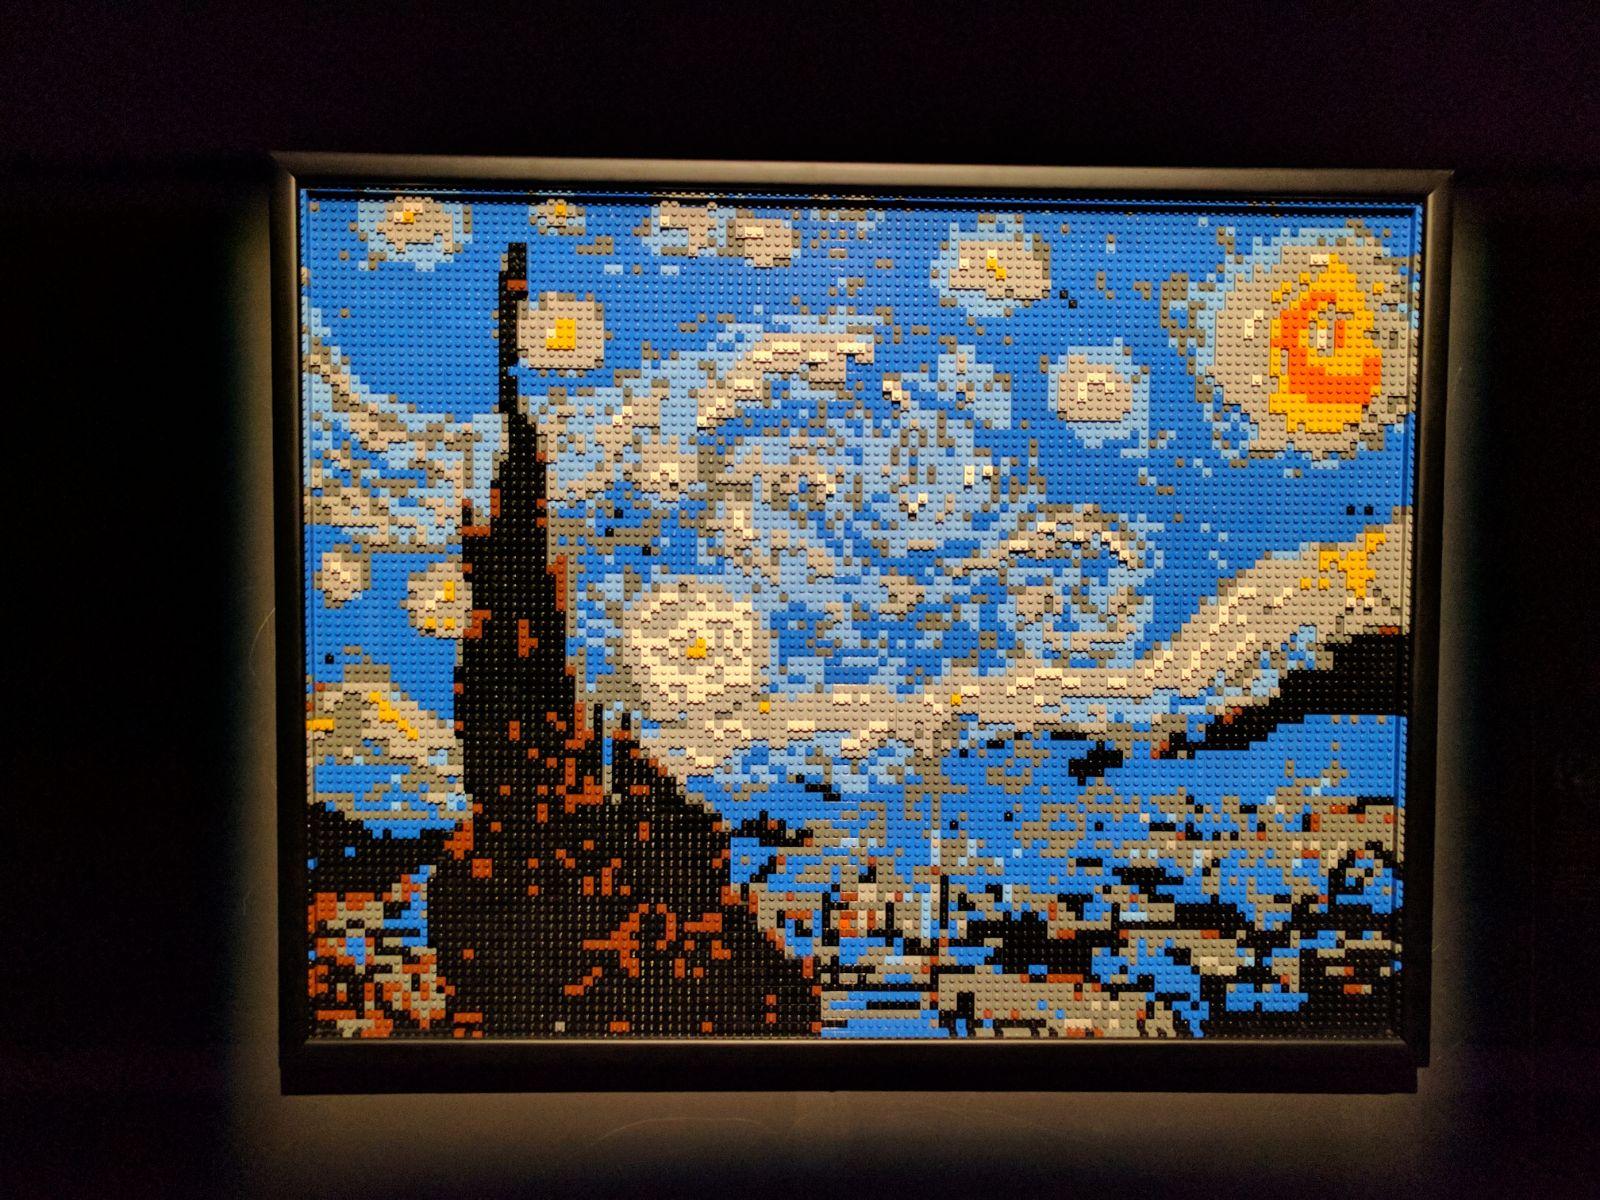 Van Gog in versione mattoncini Lego